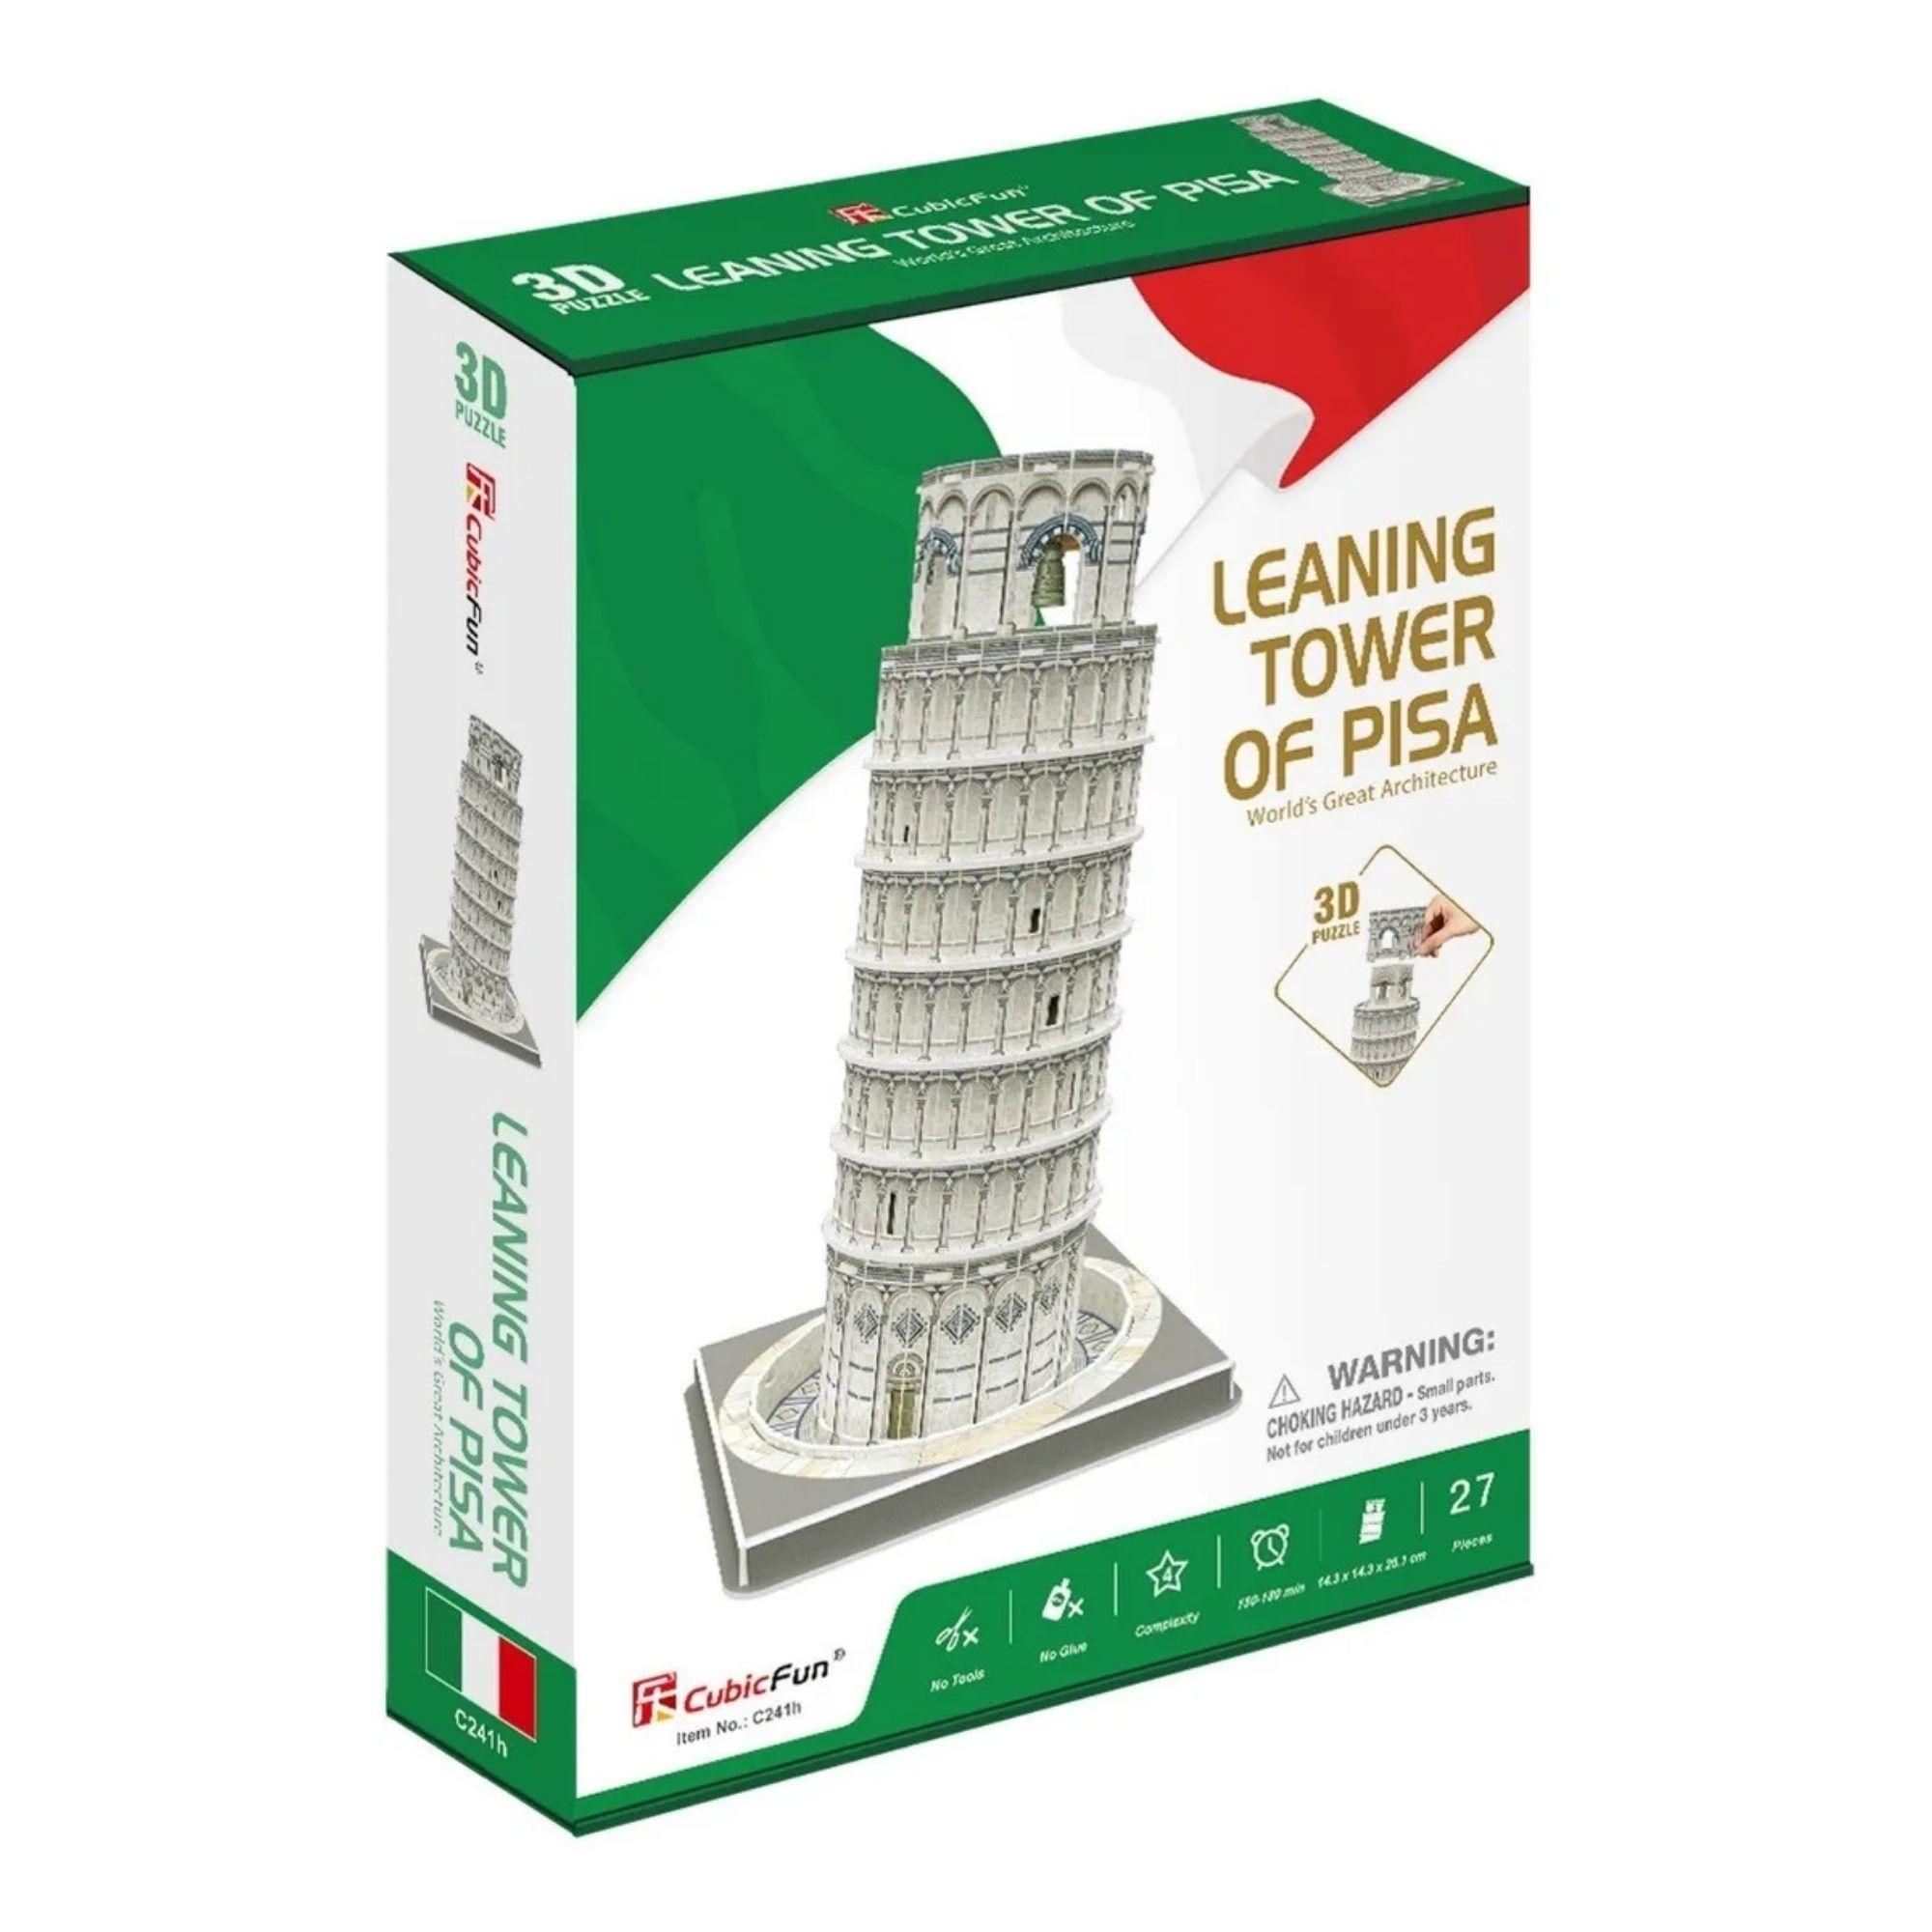 Quebra-cabeça 3D - Torre de Pisa - 27 peças - CubicFun